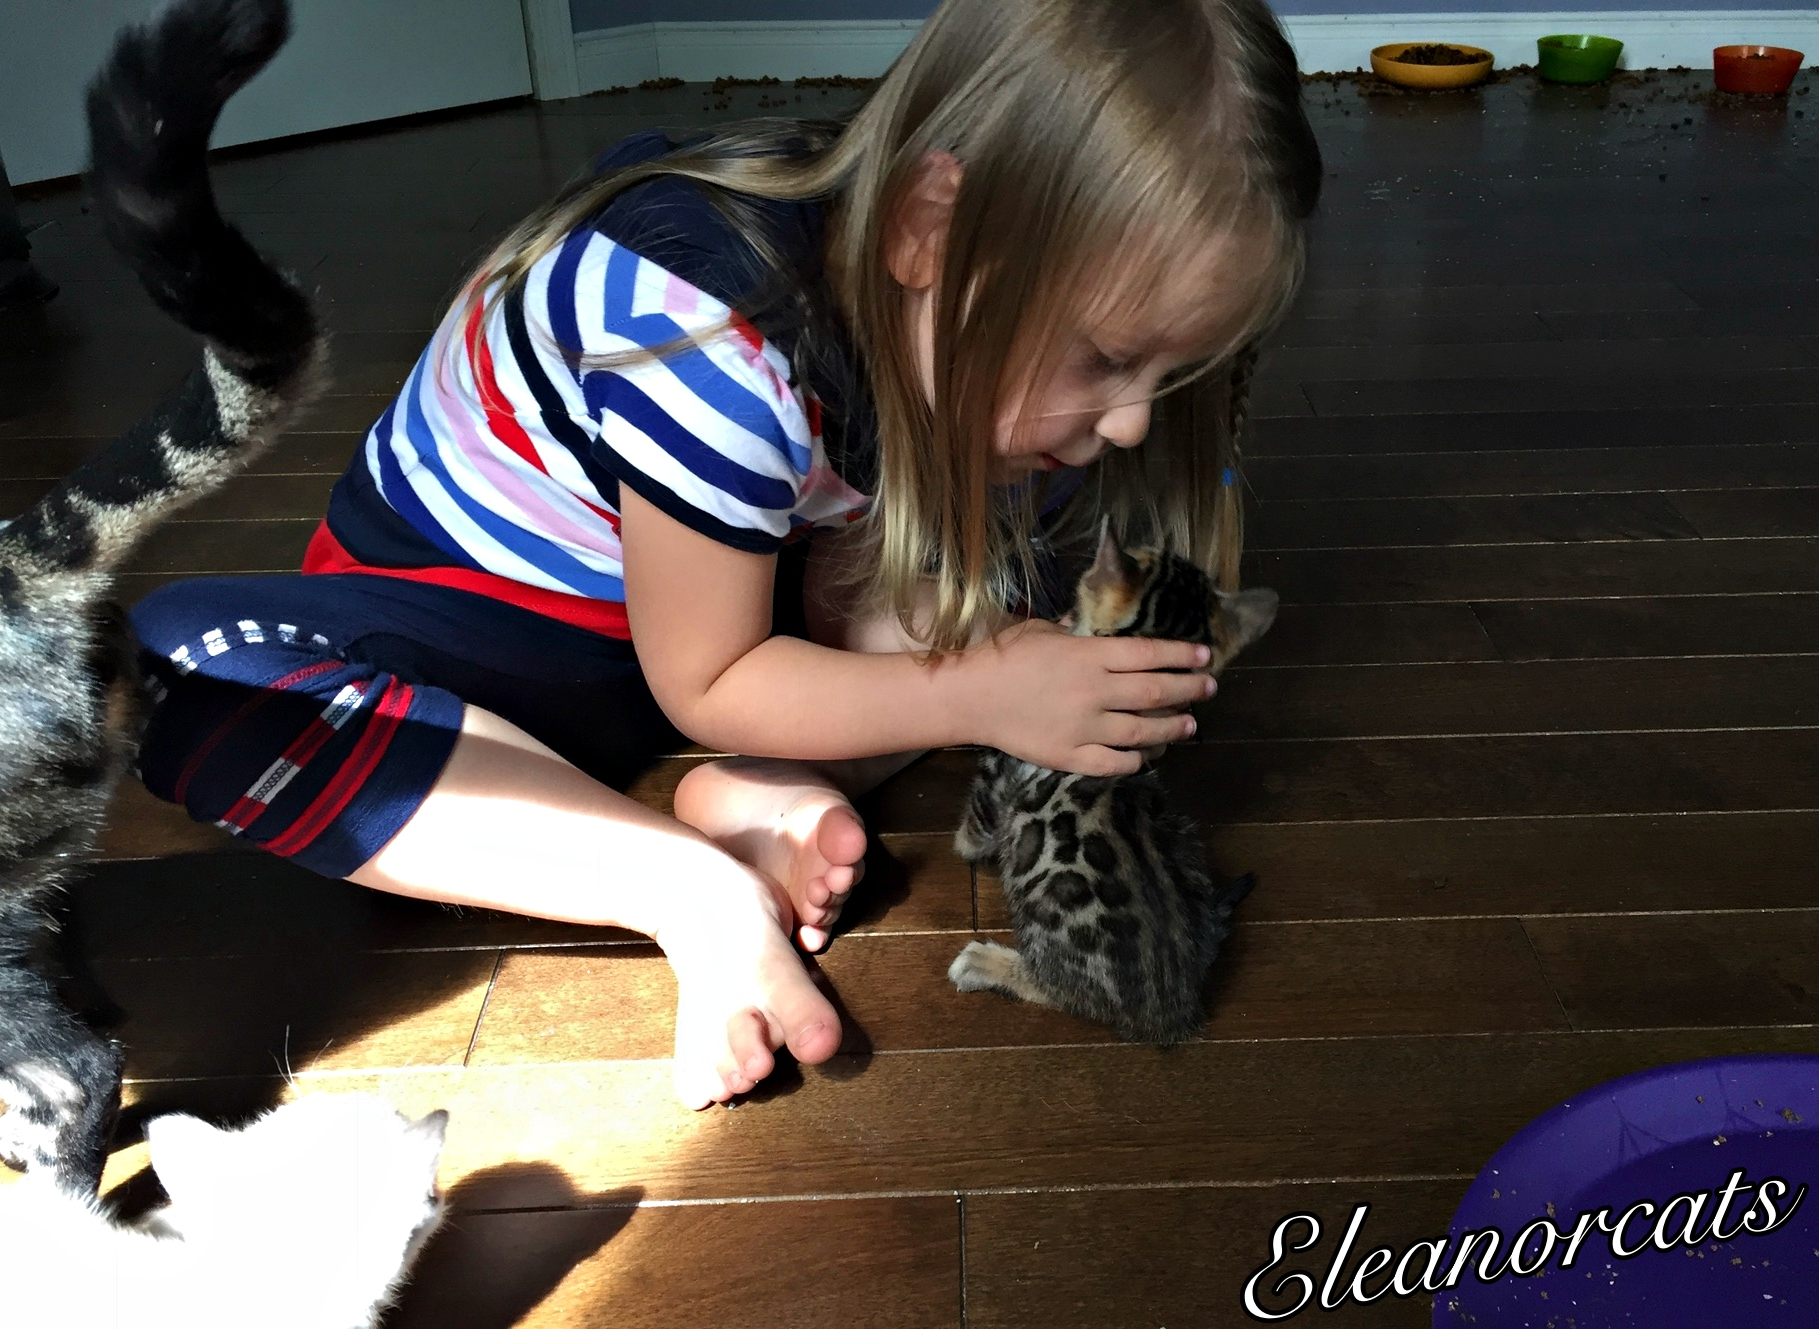 Amelyann chaton socialisation bengal eleanorcats